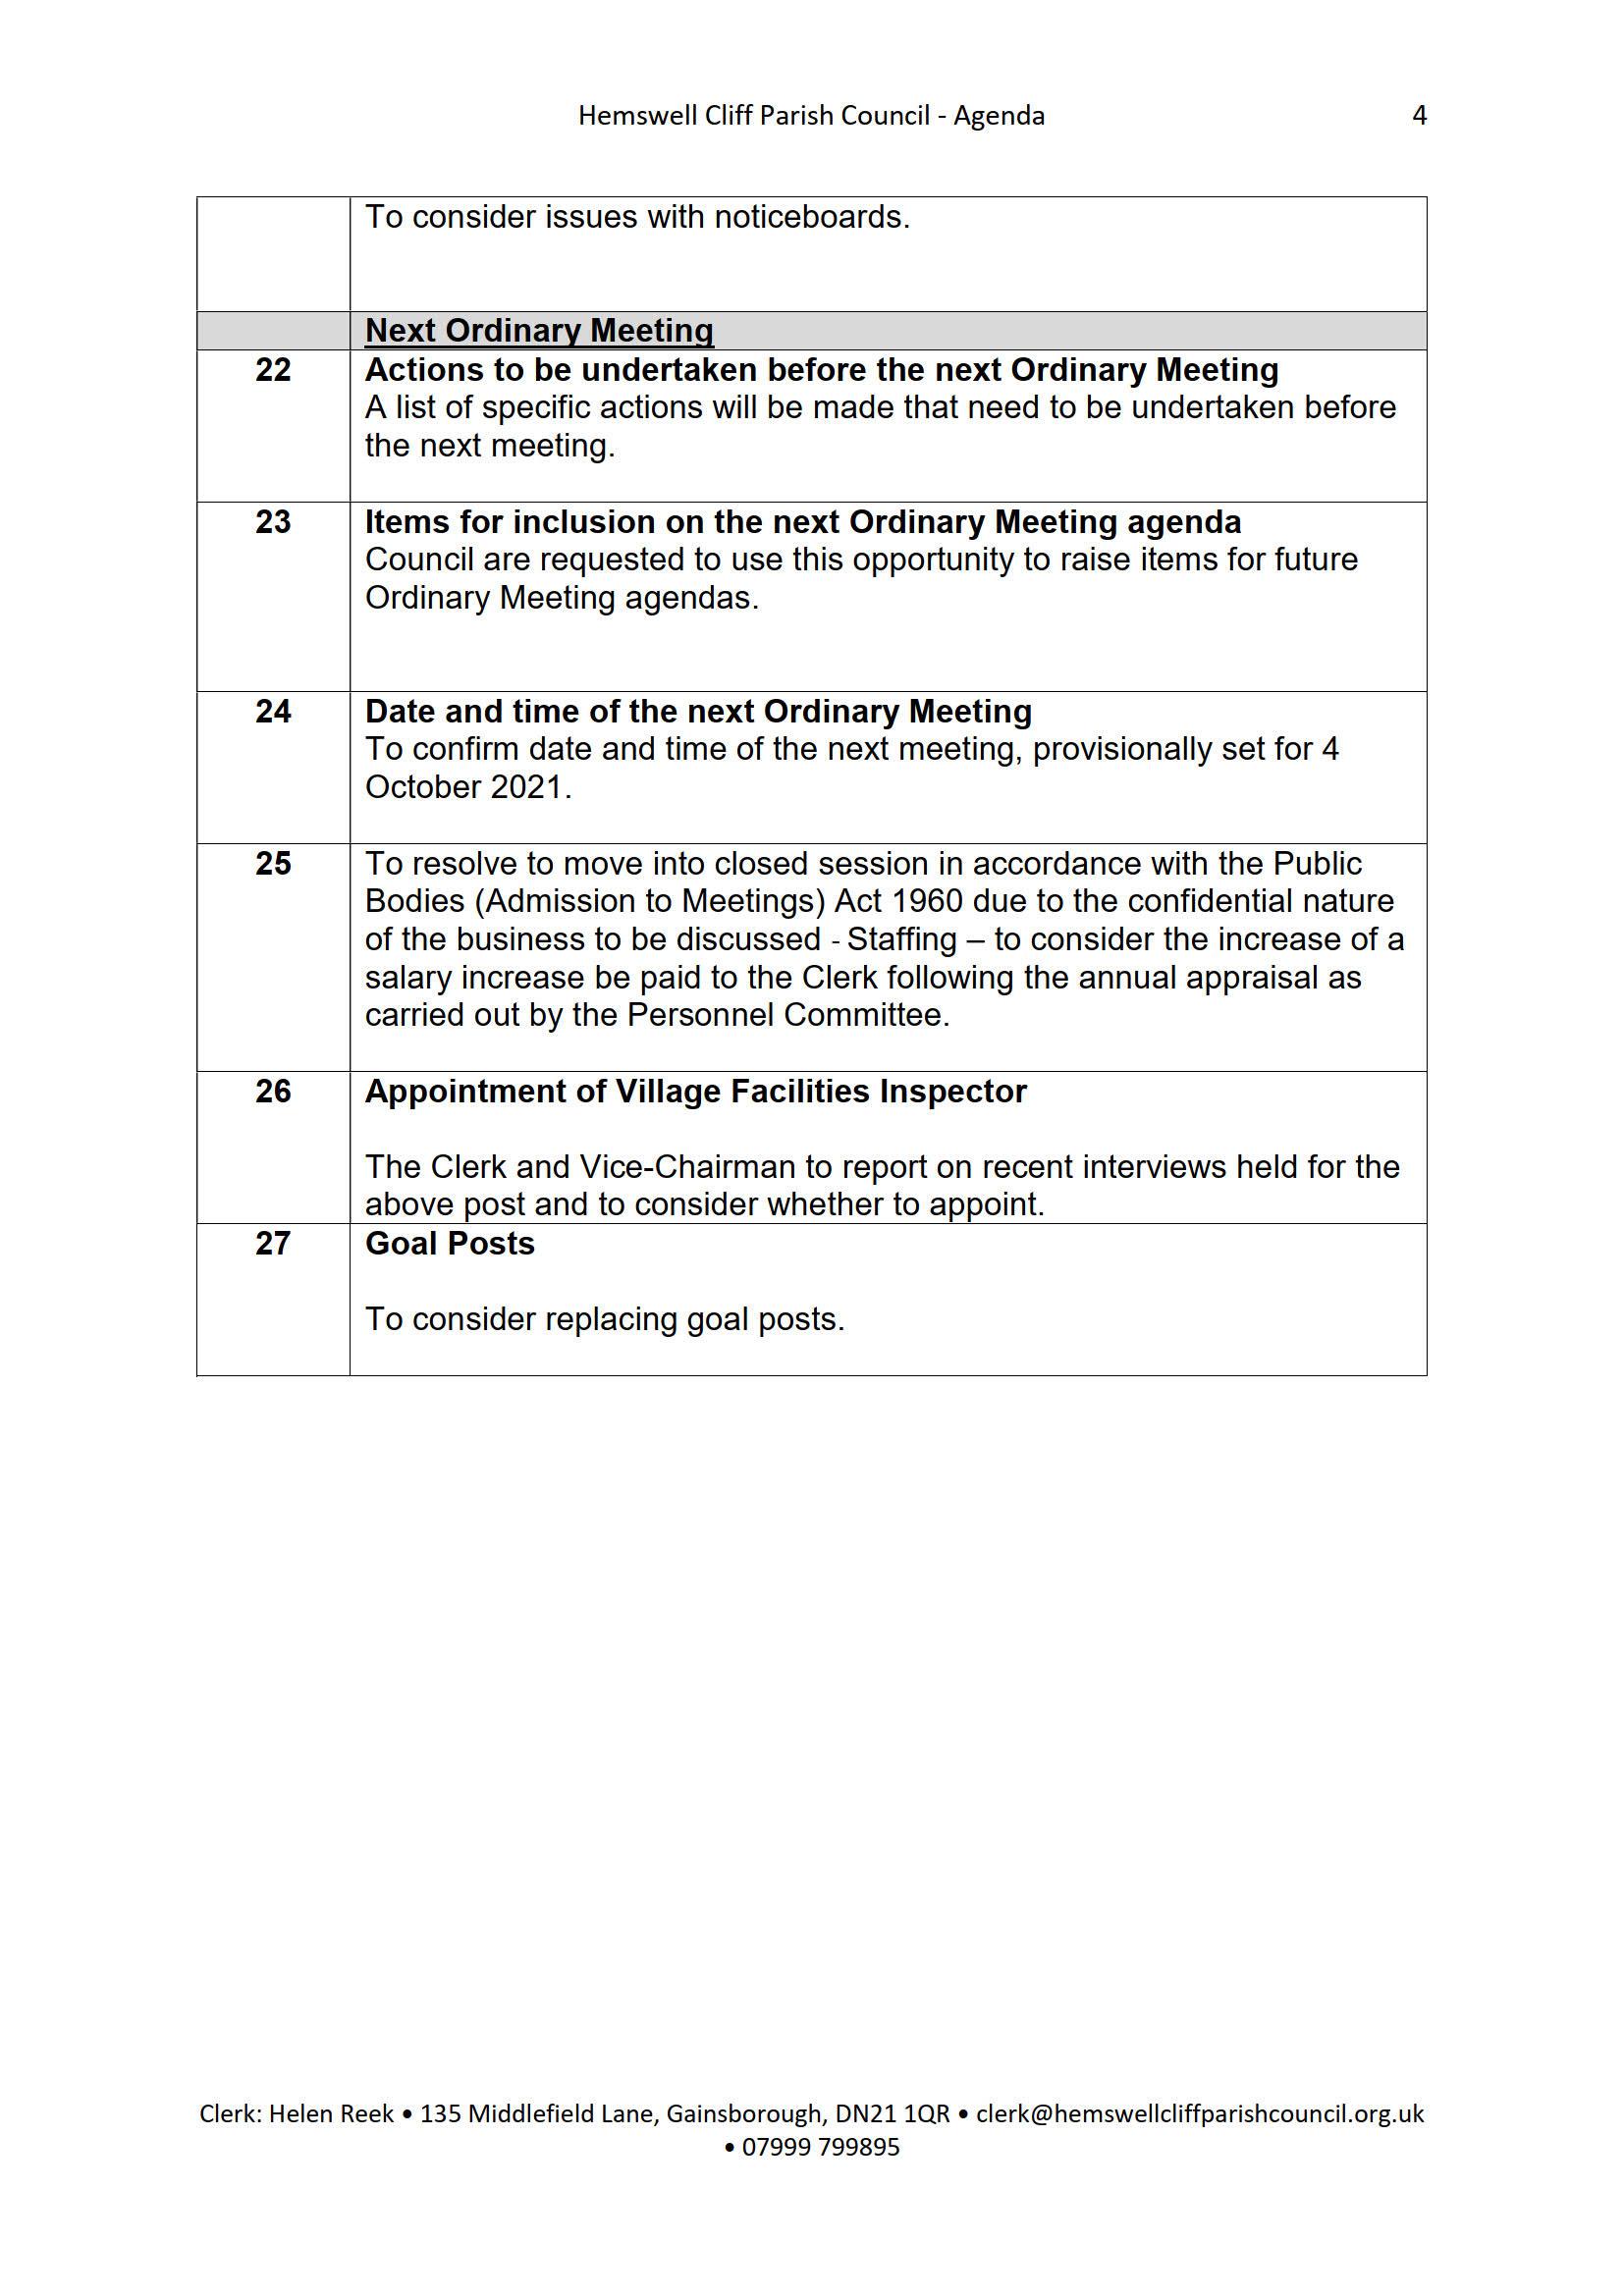 HCPC_Agenda_06.09.21_4.jpg